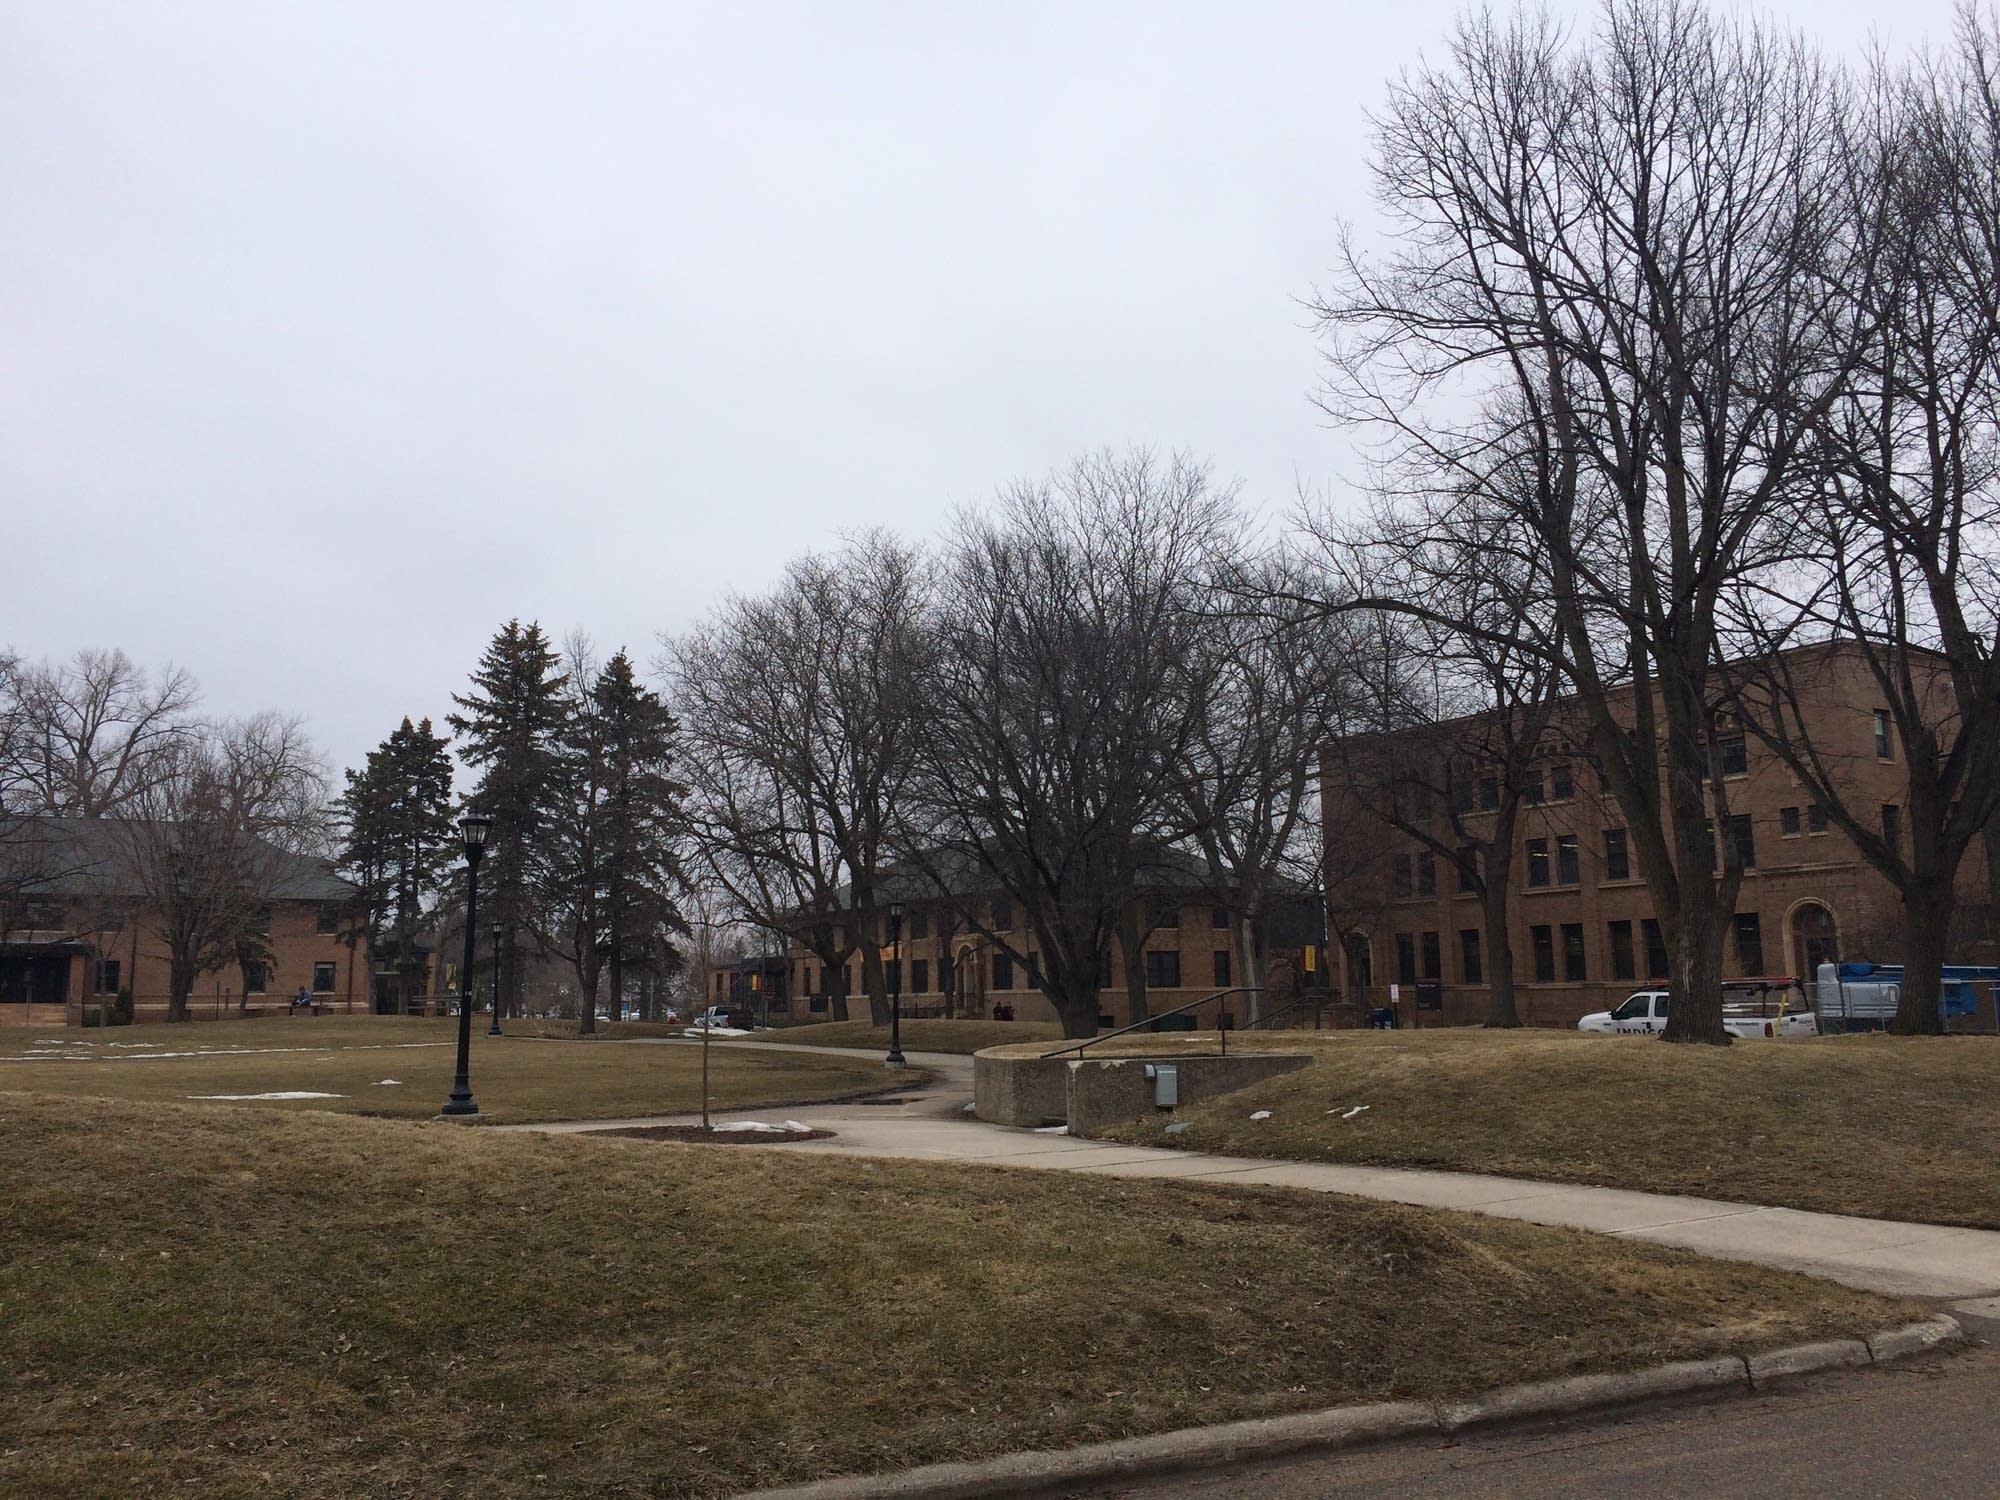 University of Minnesota Morris campus